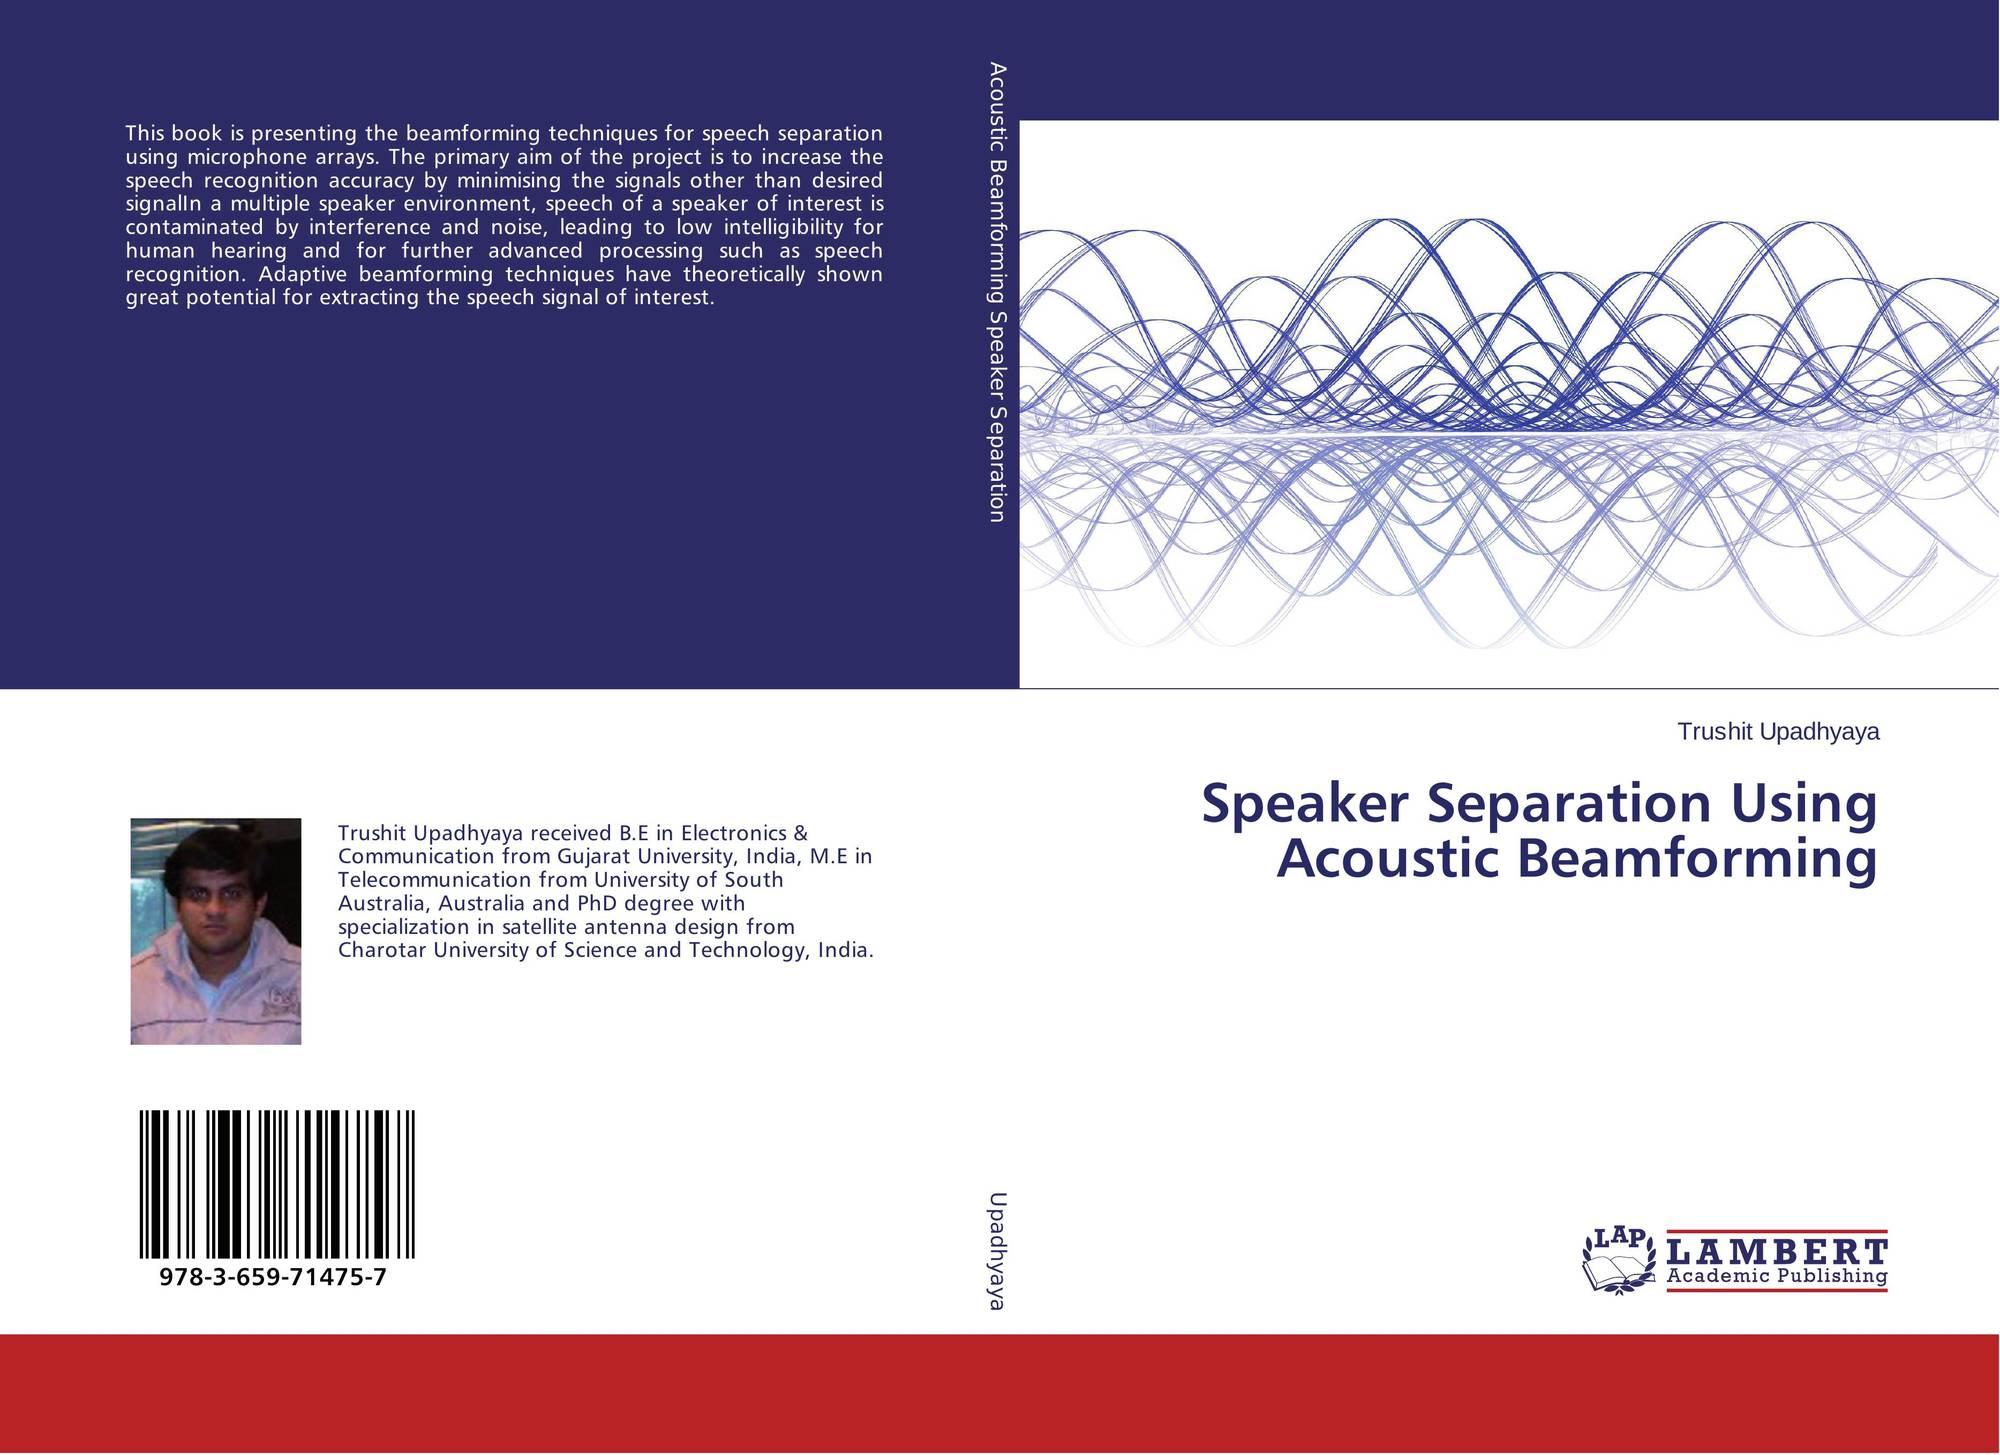 Speaker Separation Using Acoustic Beamforming, 978-3-659